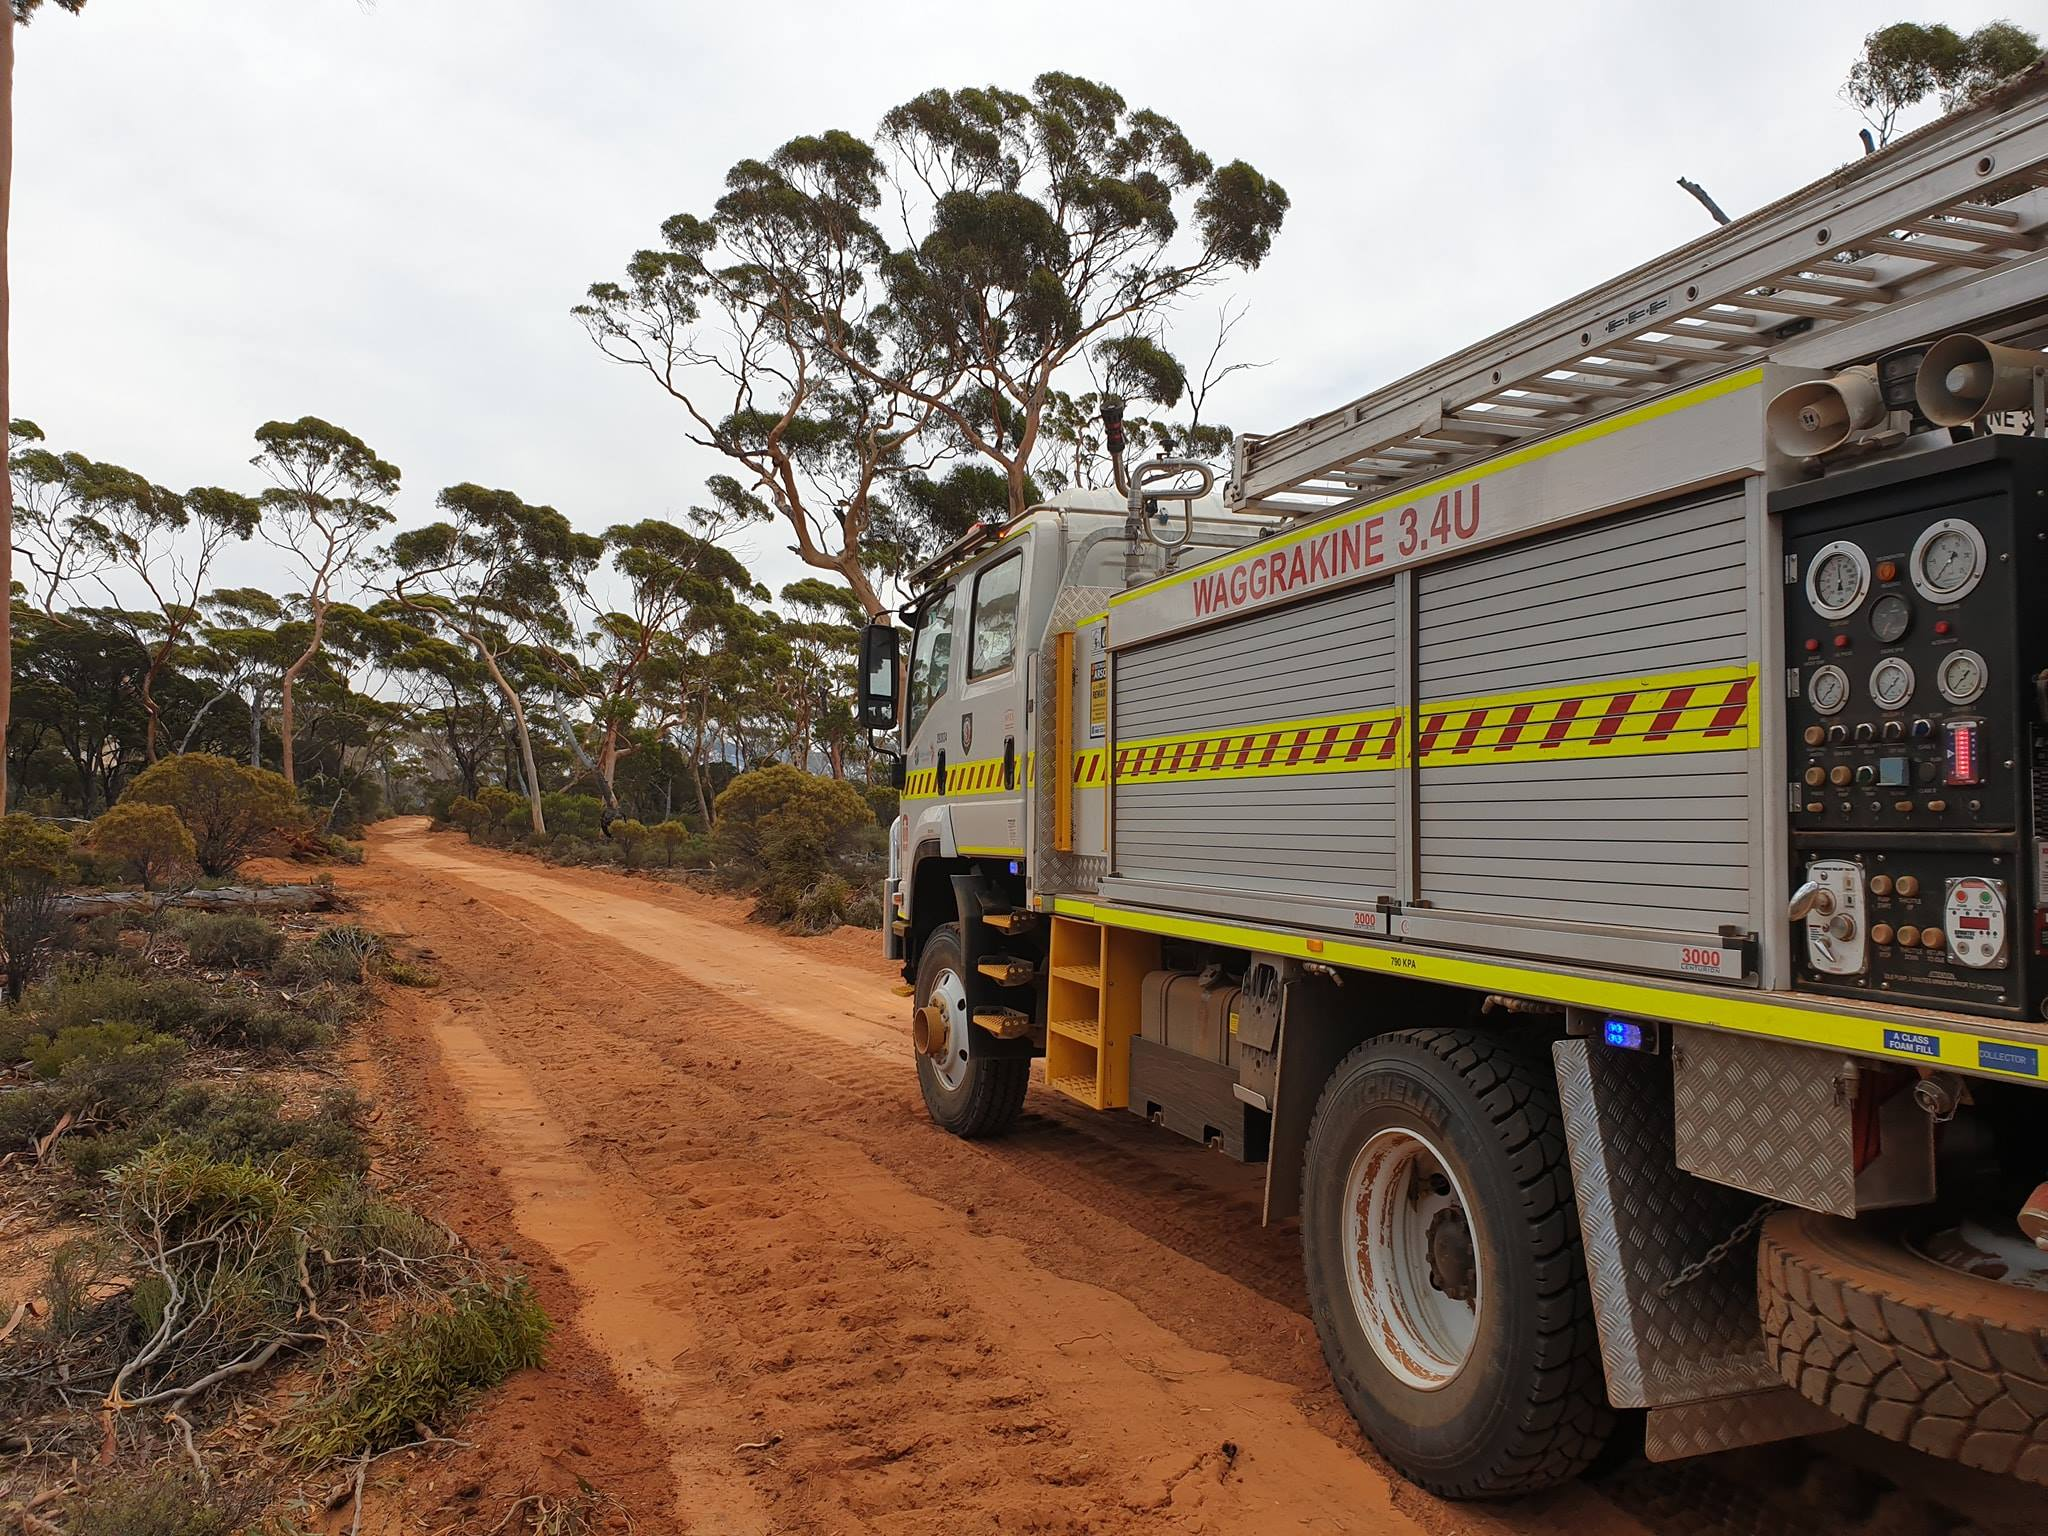 Waggrakine Volunteer Bushfire Brigade appliance in Norseman Western Australia March 2019